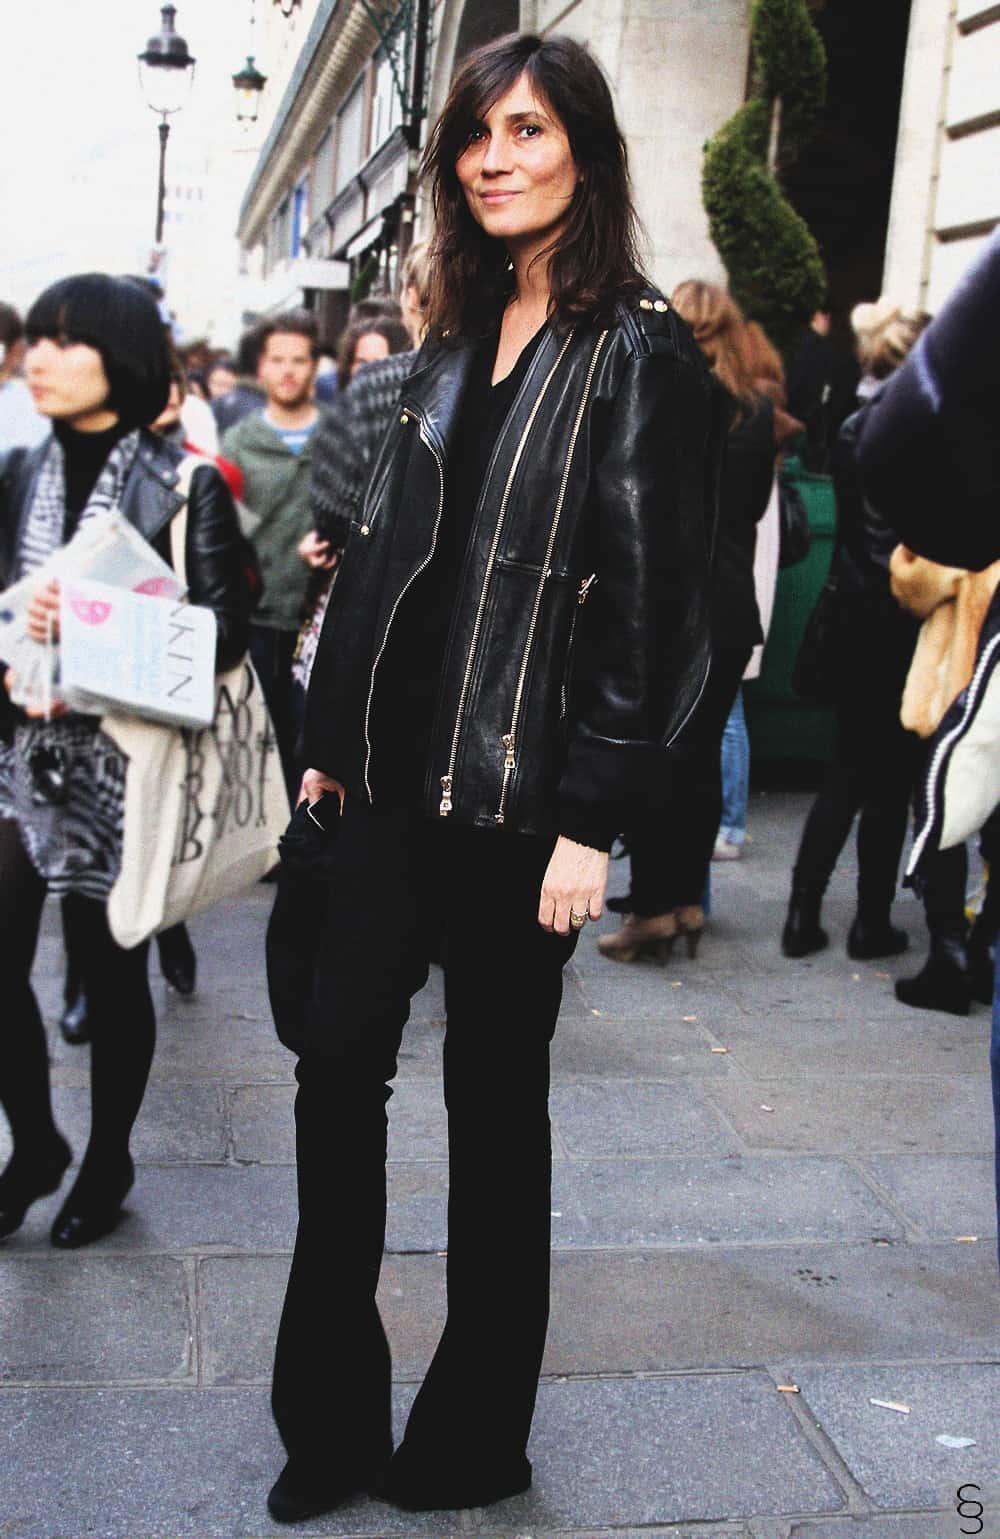 oversized-leather-jacket-autumn-looks-16